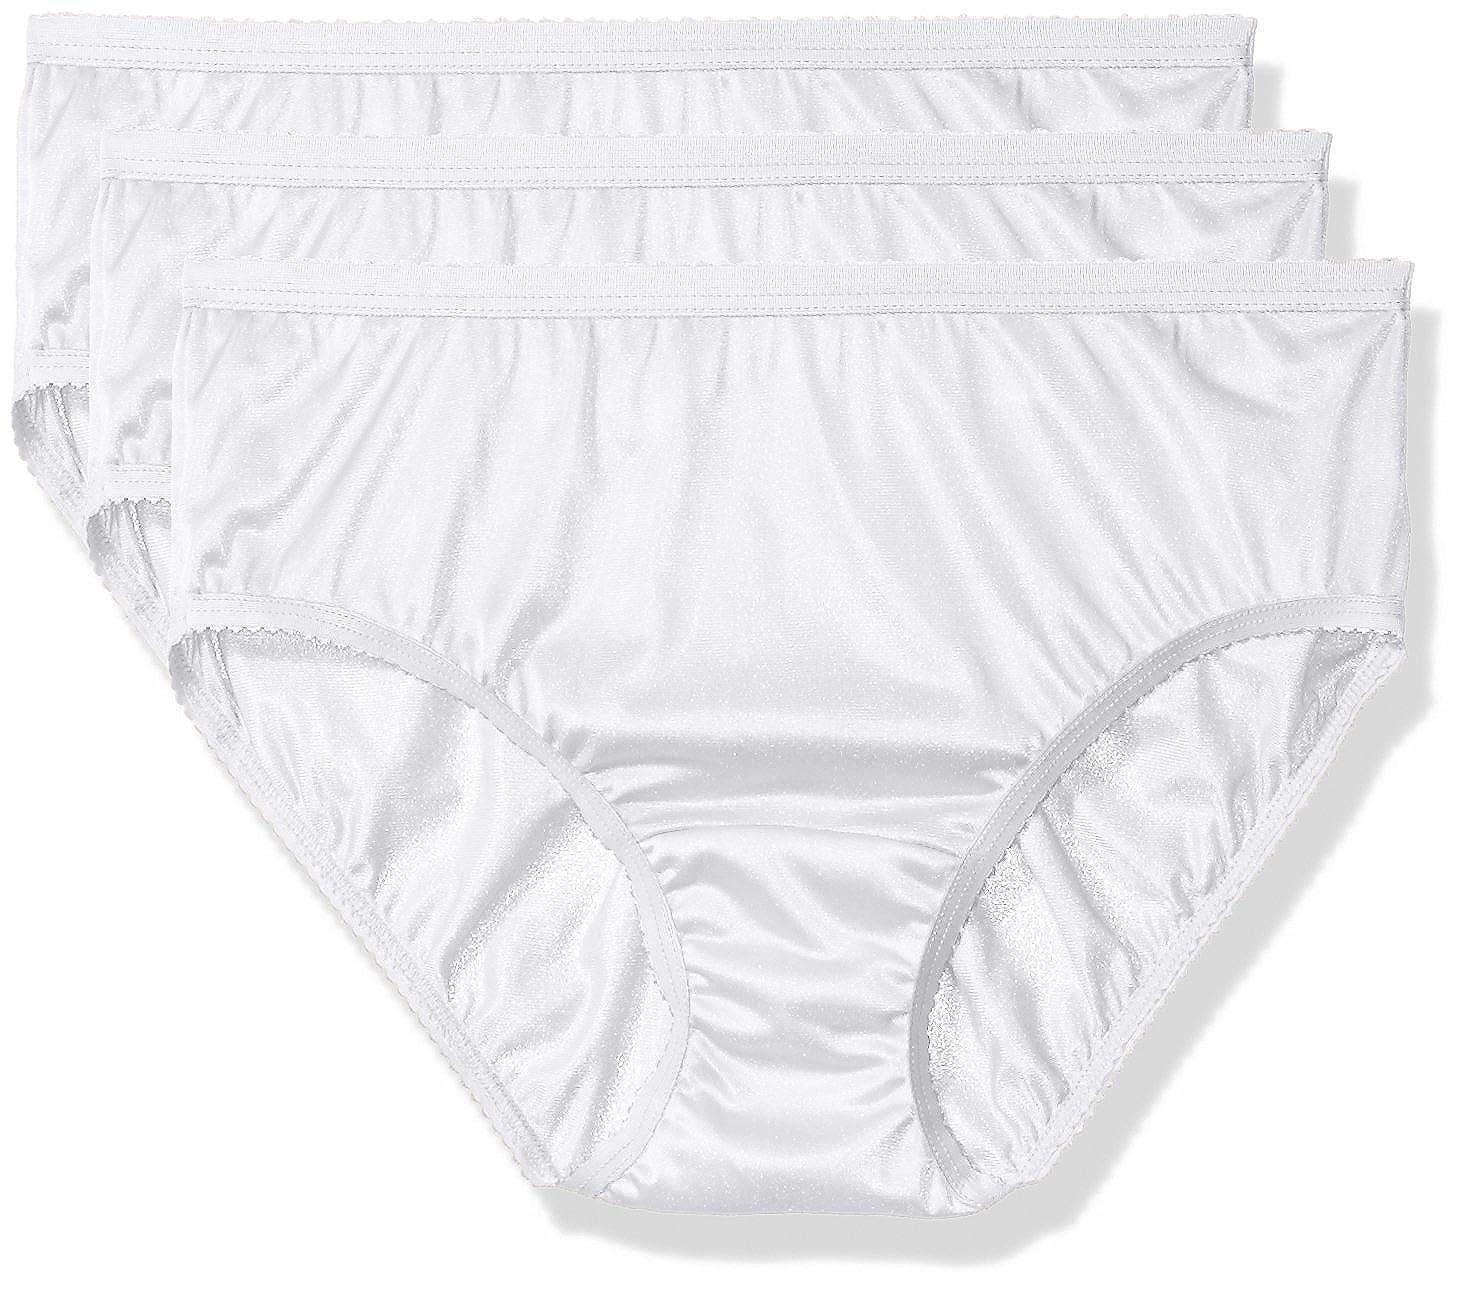 Shadowline Women's Panties-Nylon Hipster (3 Pack) Shadowline Sleepwear 11042